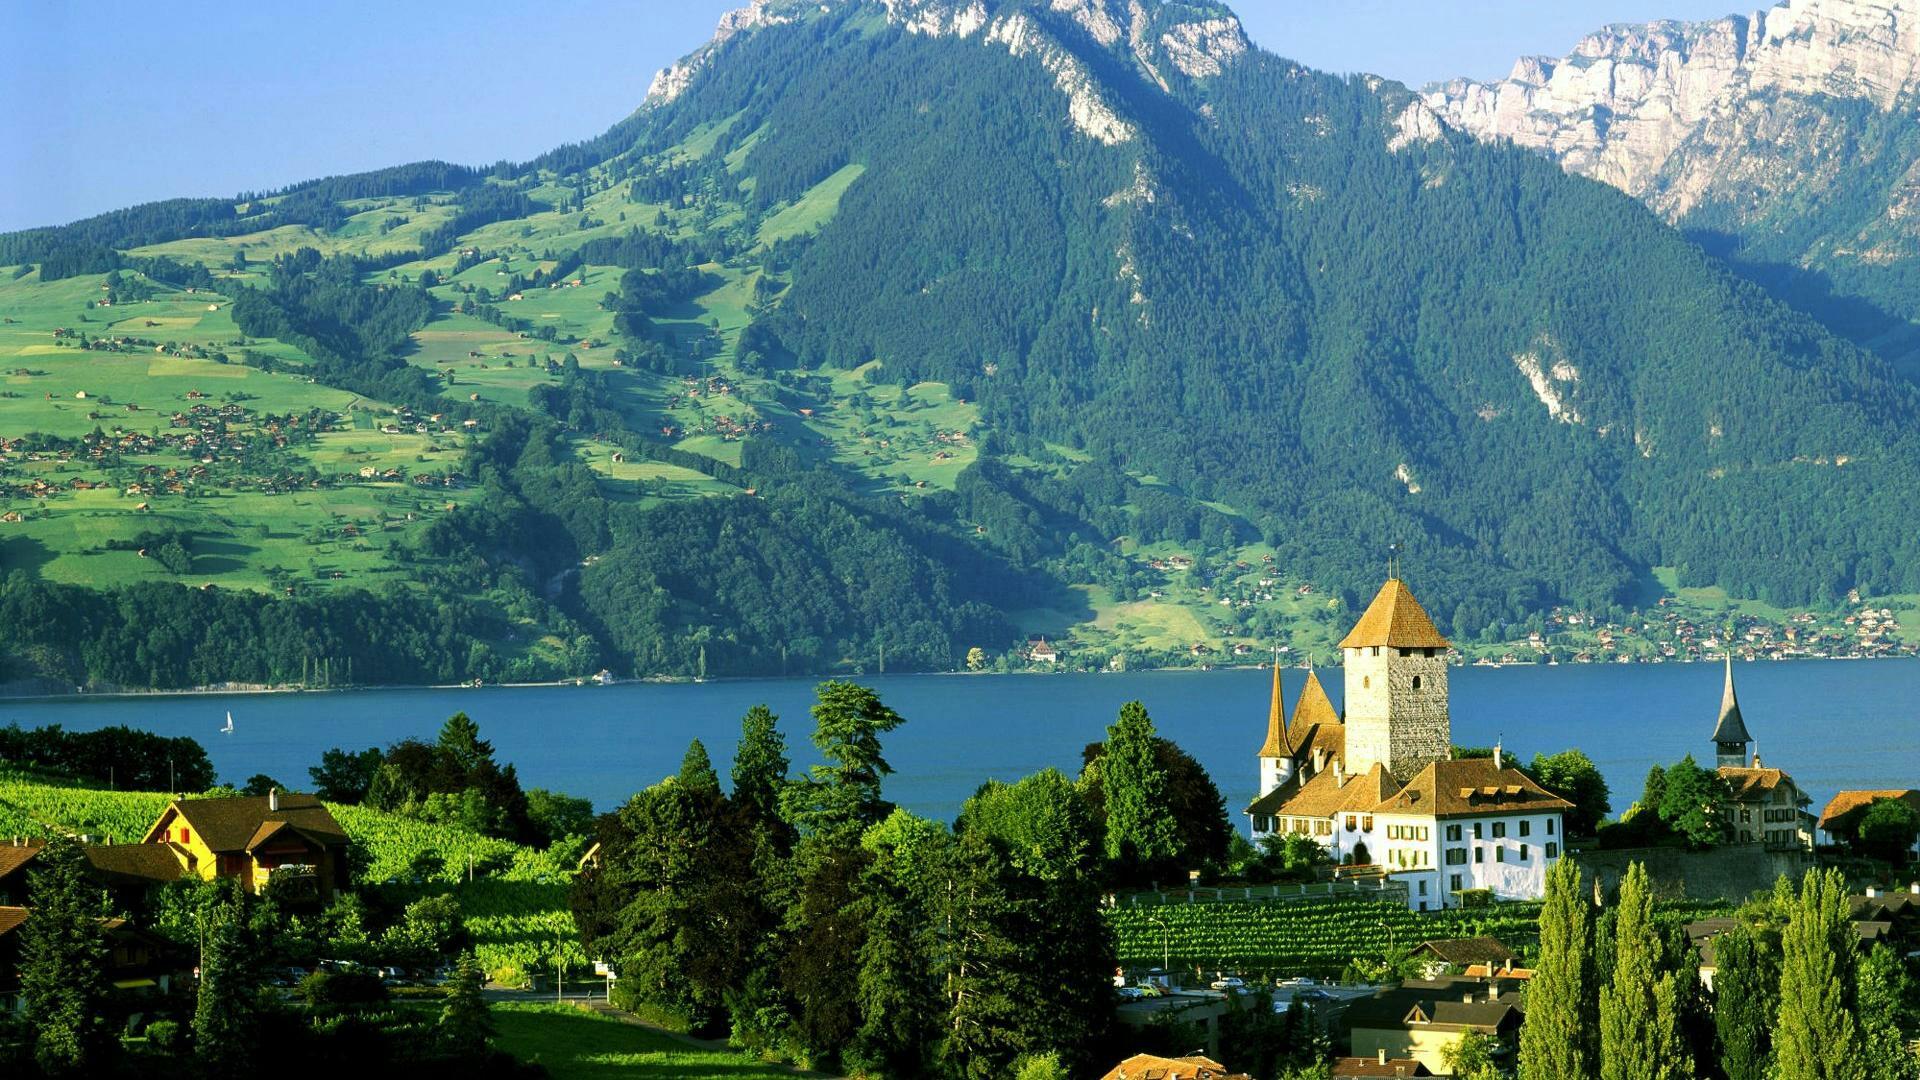 Schloss Spiez at the Lake Thun, Switzerland  wallpaper